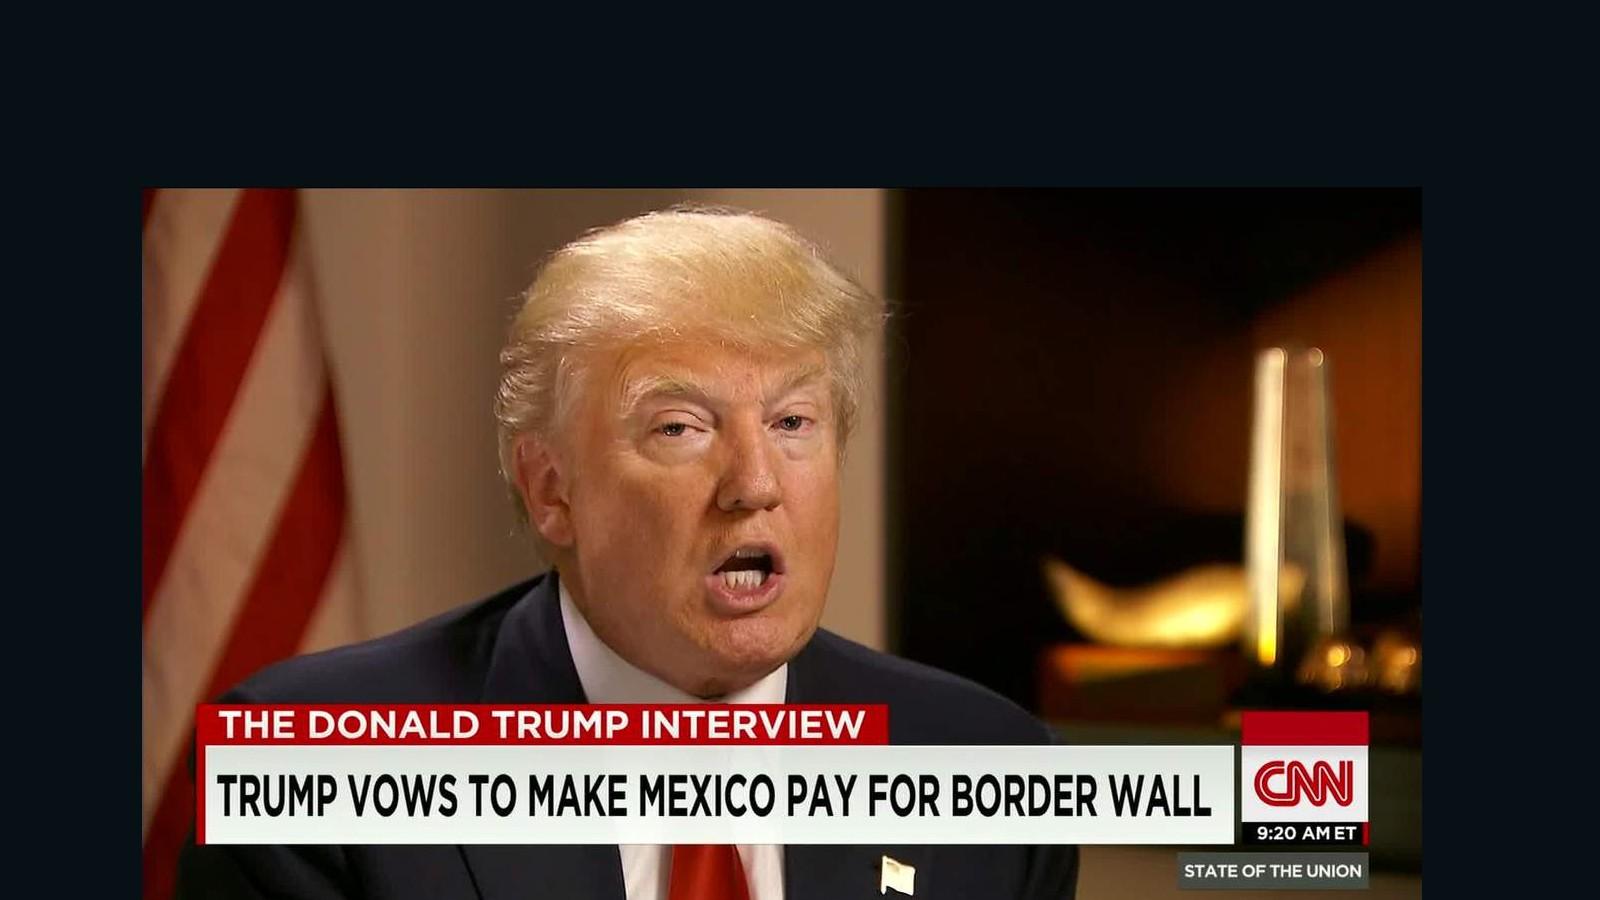 150628100138-donald-trump-mexico-immigra